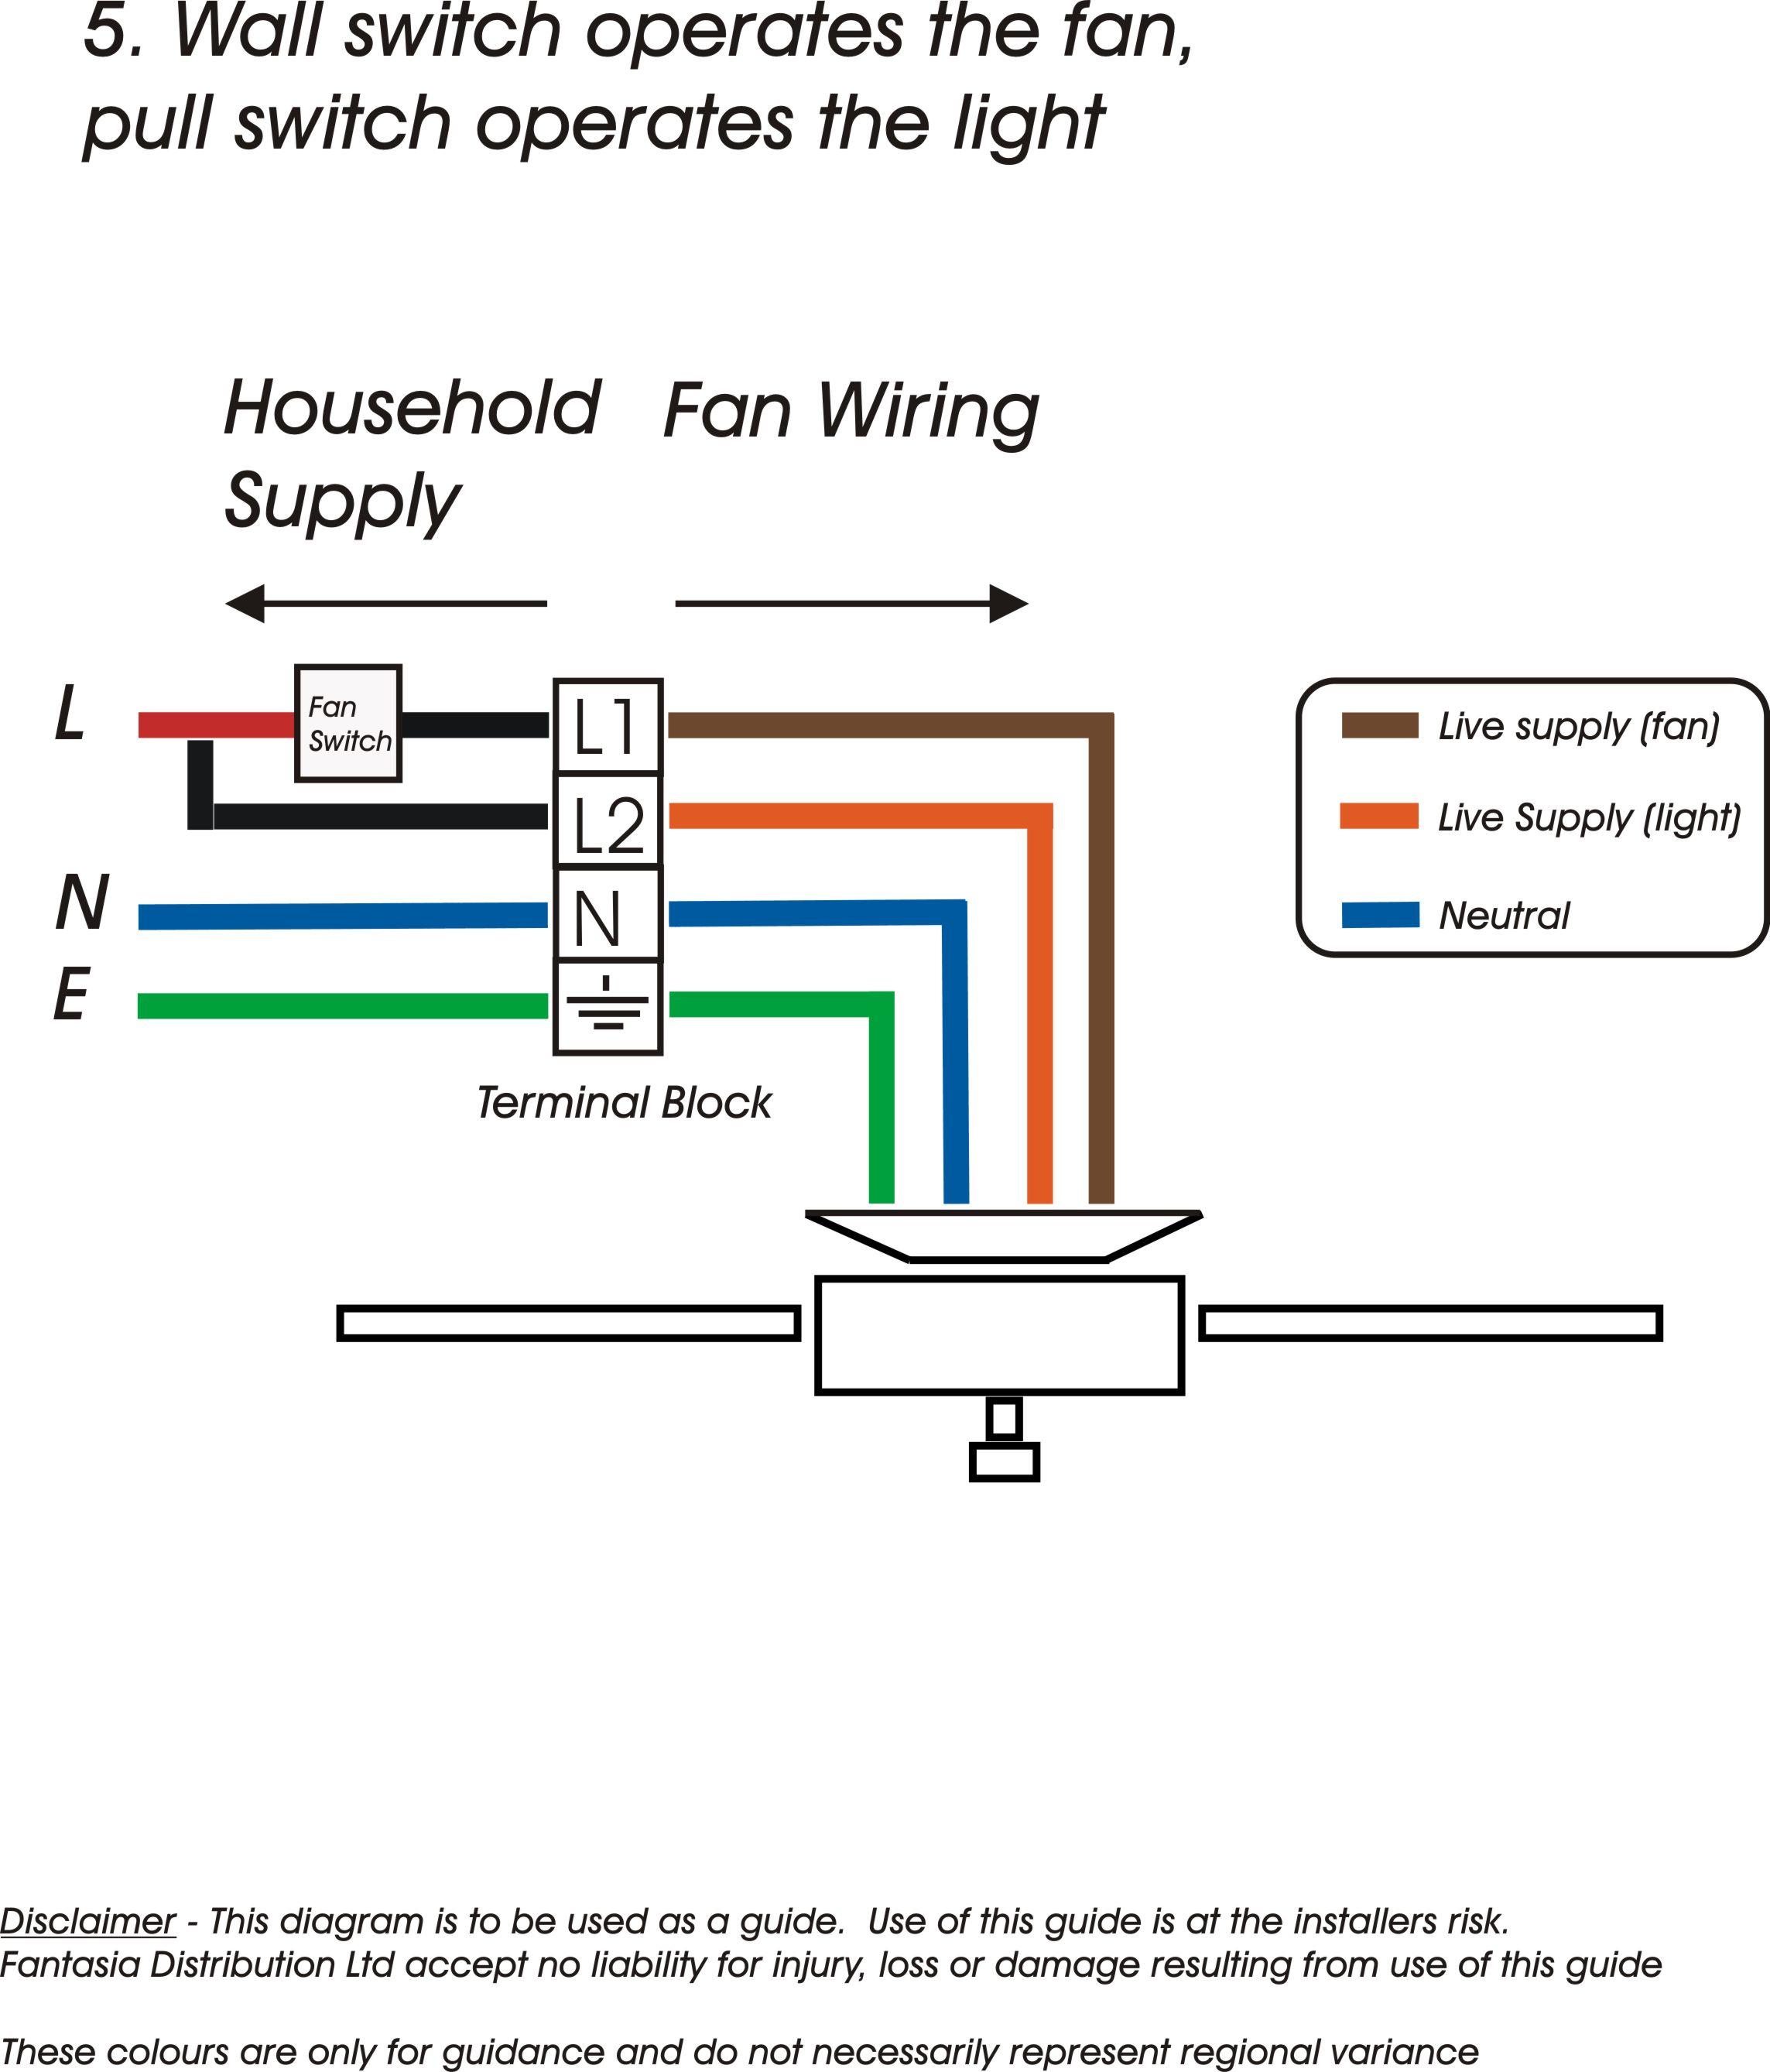 Fantastic Vent Fan Wiring Diagram | Wiring Diagram - Fantastic Vent Wiring Diagram